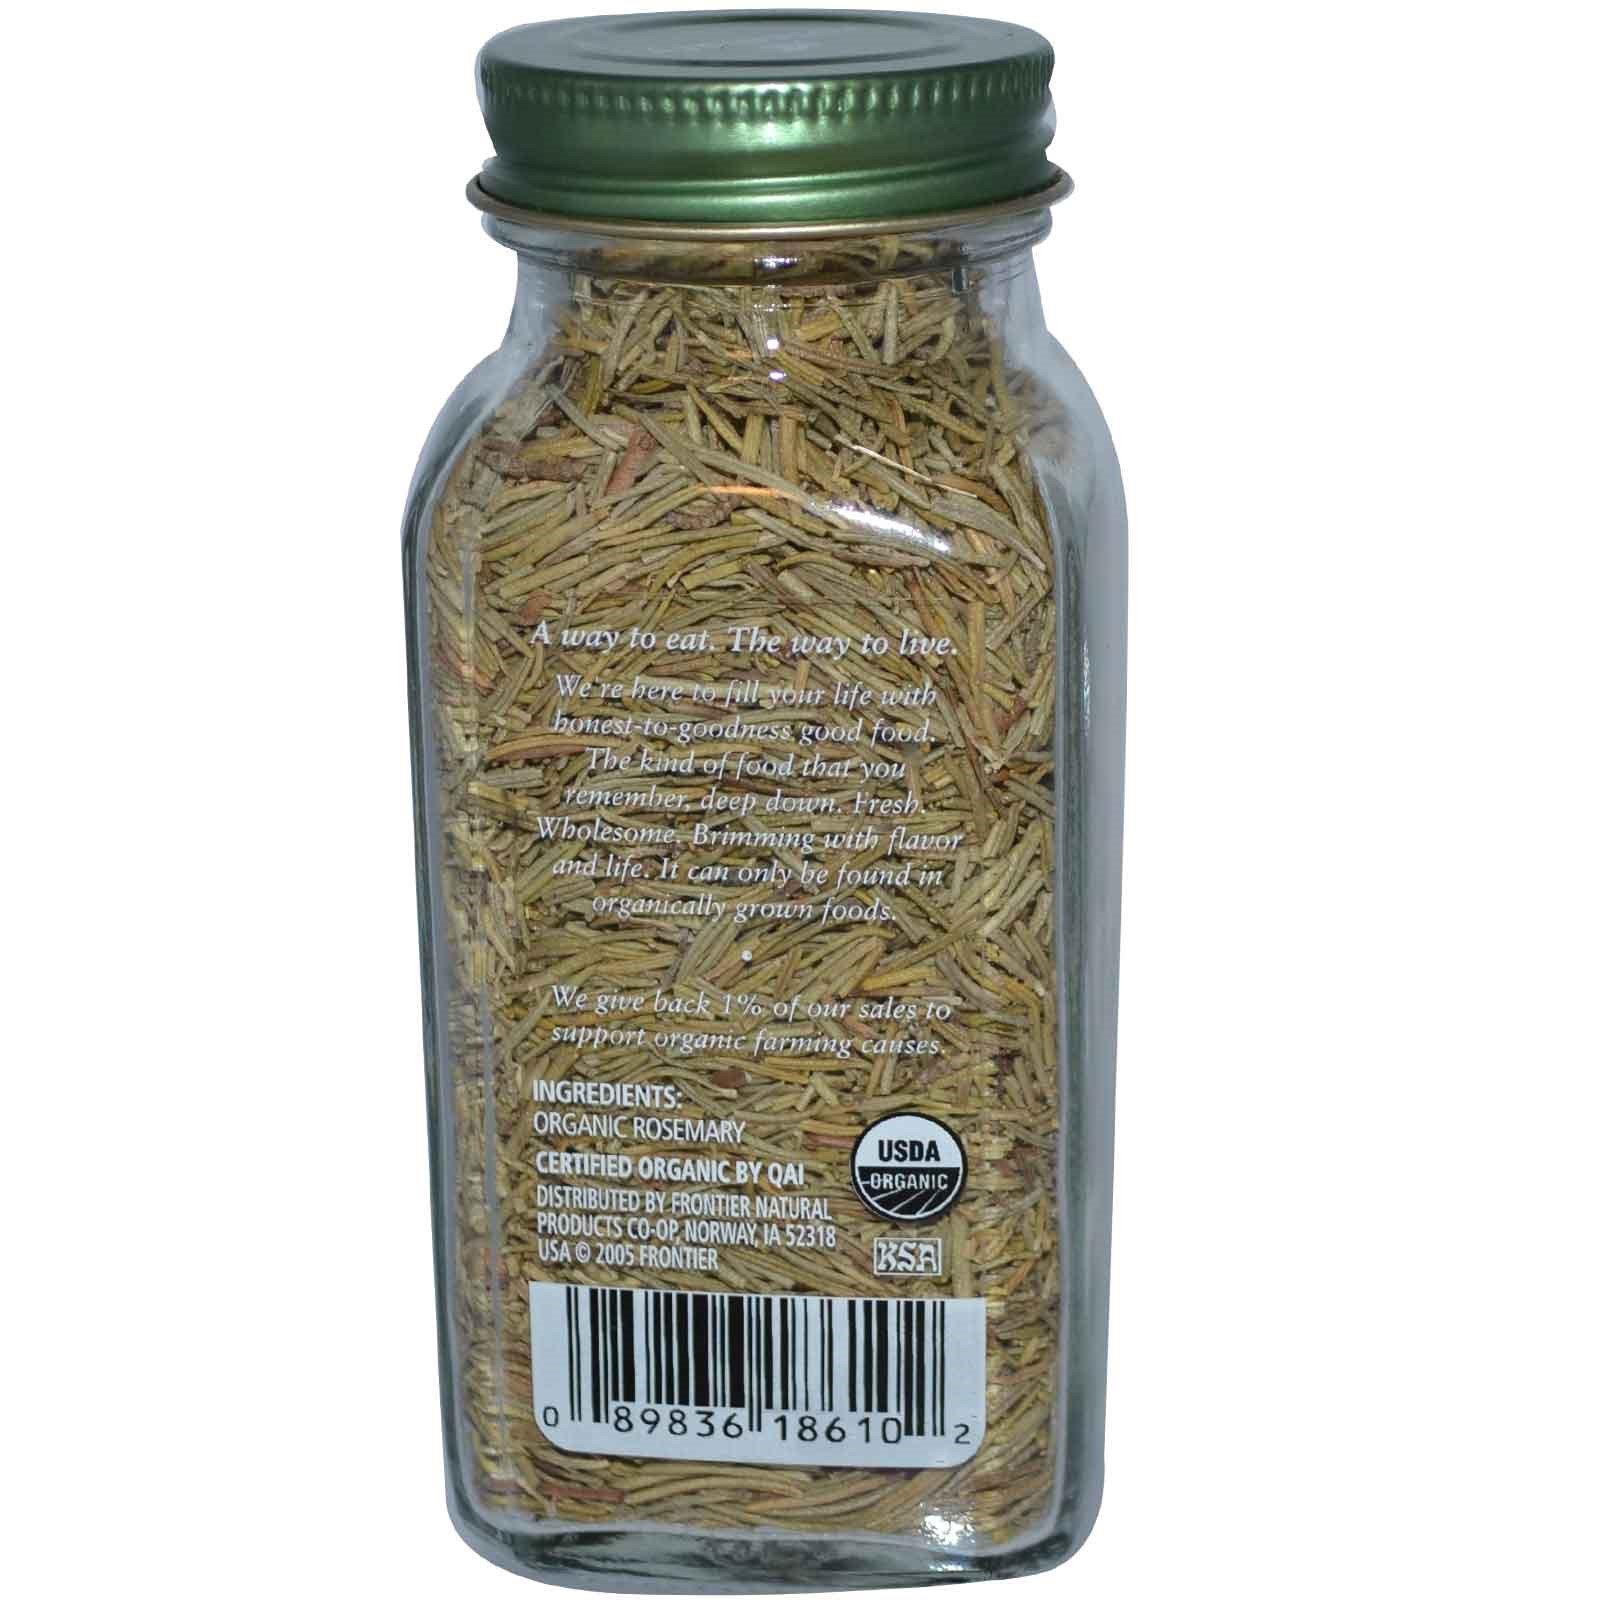 Simply Organic, Розмарин, 1.23 унция (35 г)